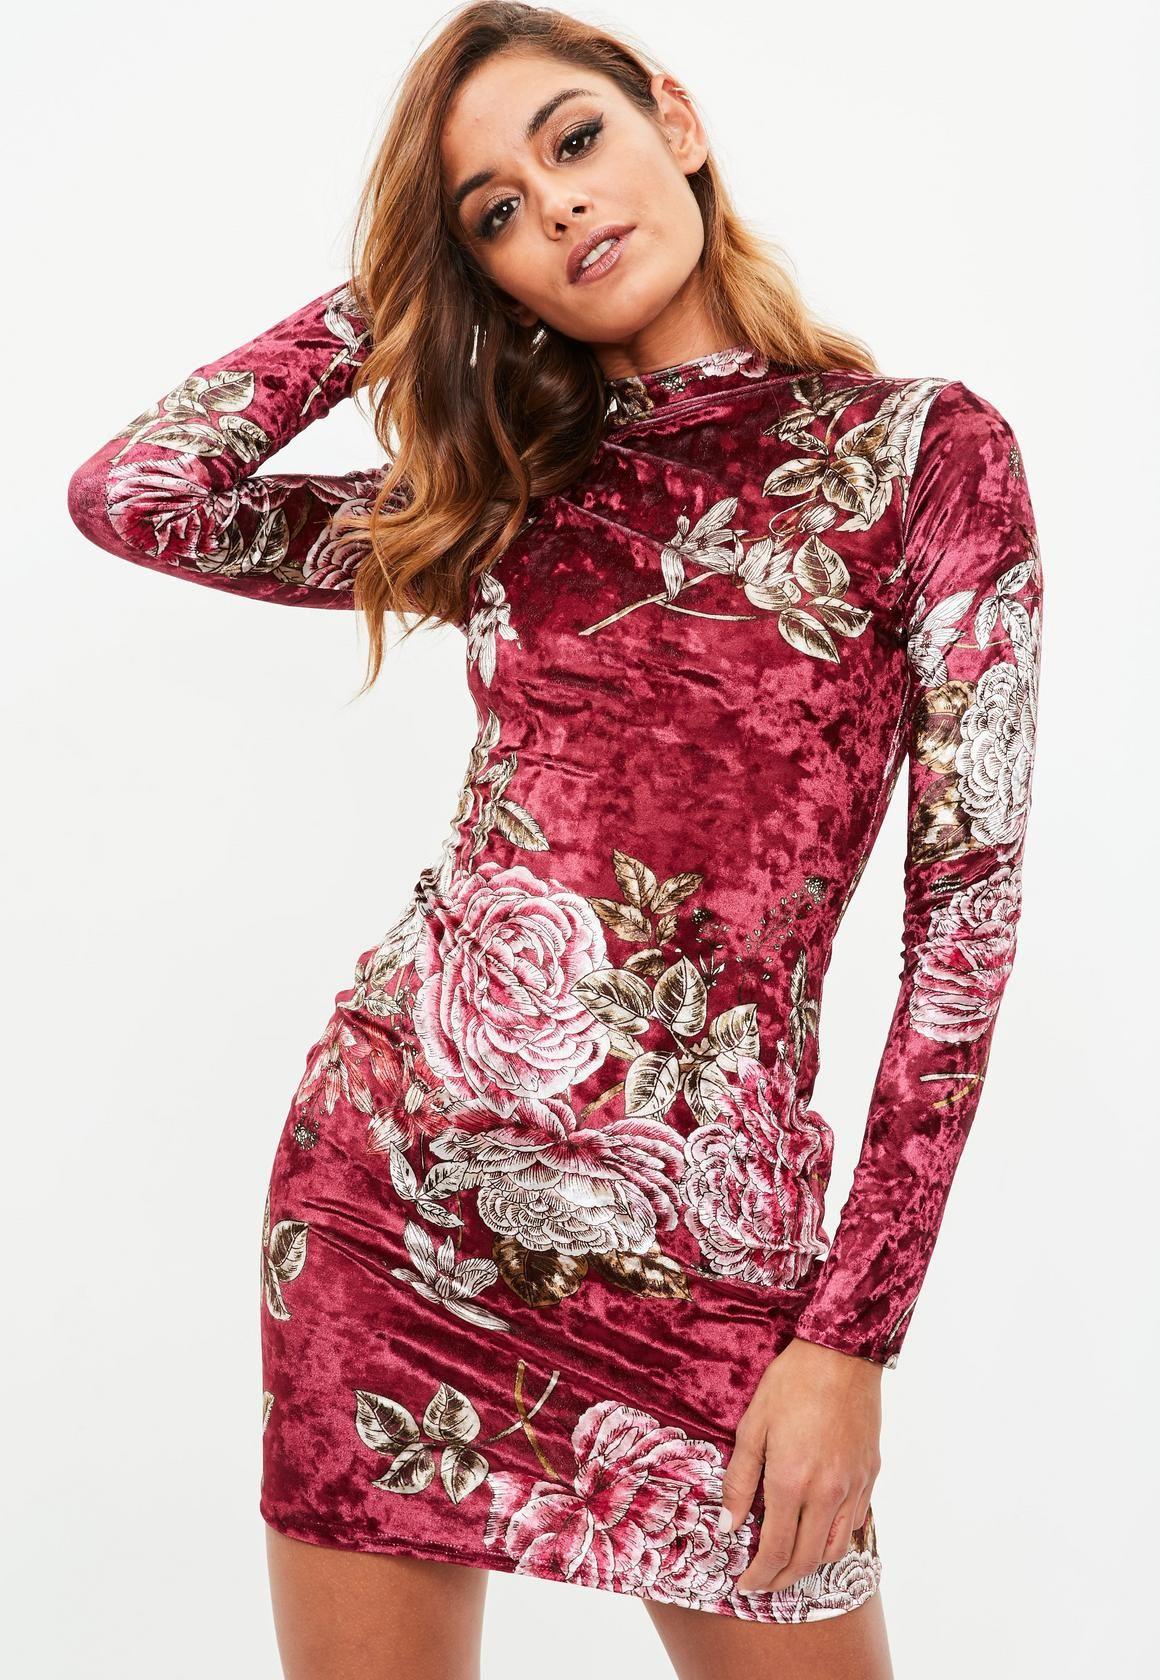 83db96d8b5bf3c Missguided - Burgundy High Neck Velvet Floral Printed Dress Vakantie Jurken